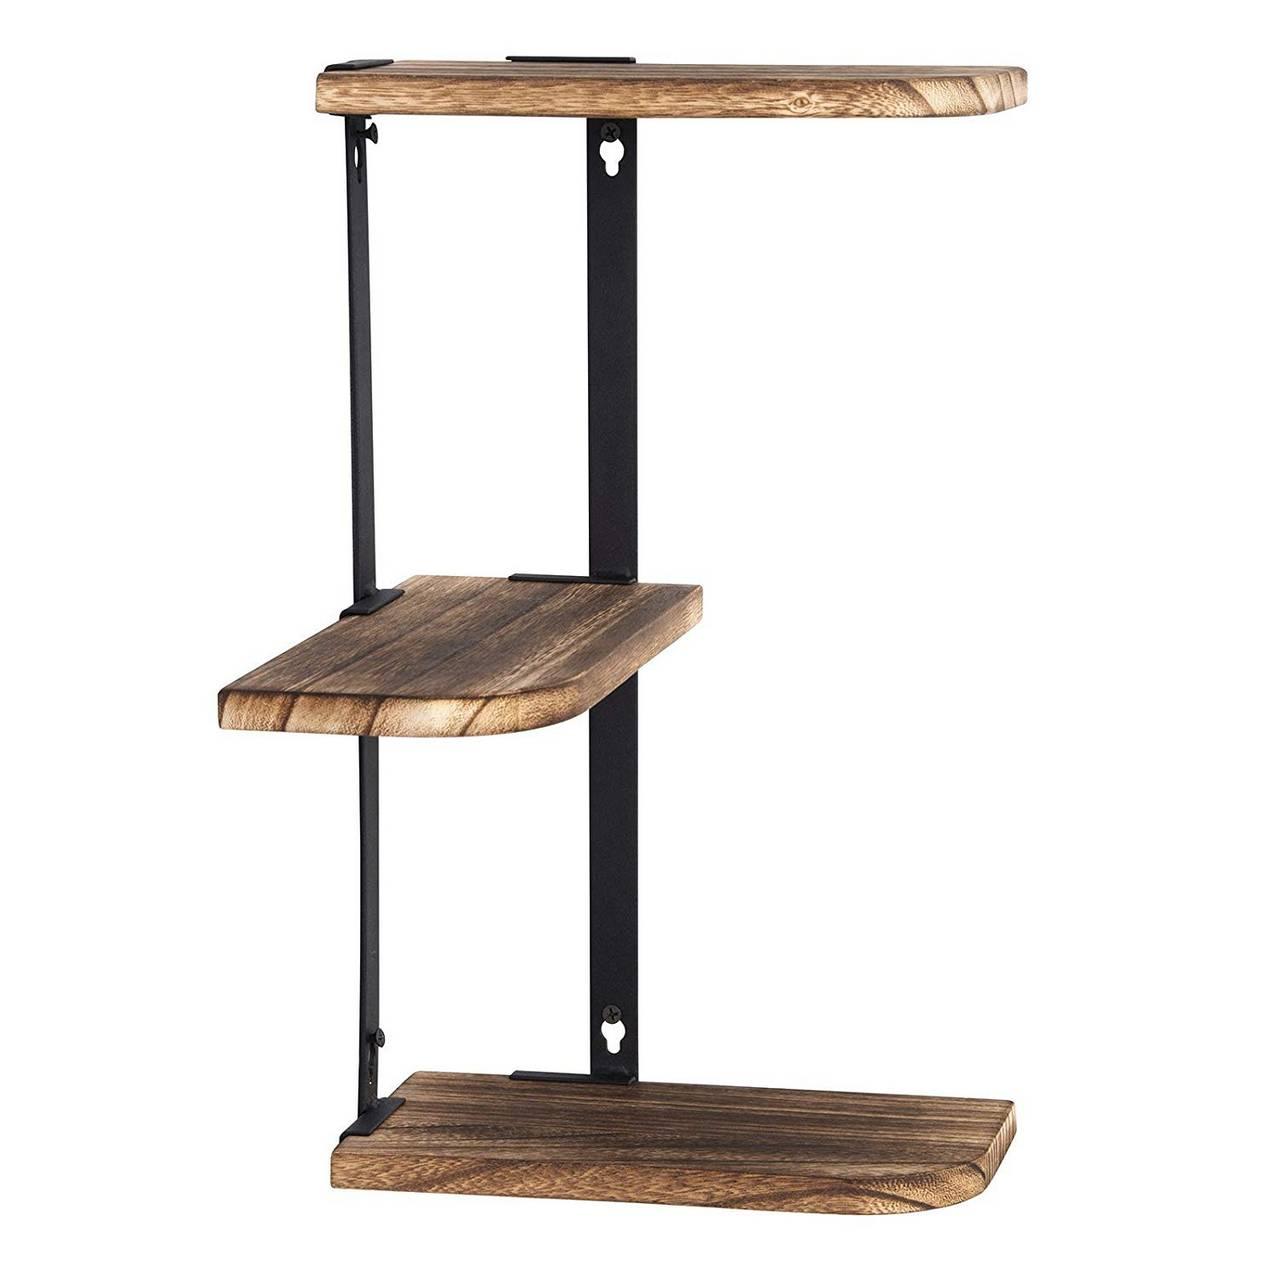 Wandregal Eckregal aus Holz und Metall1